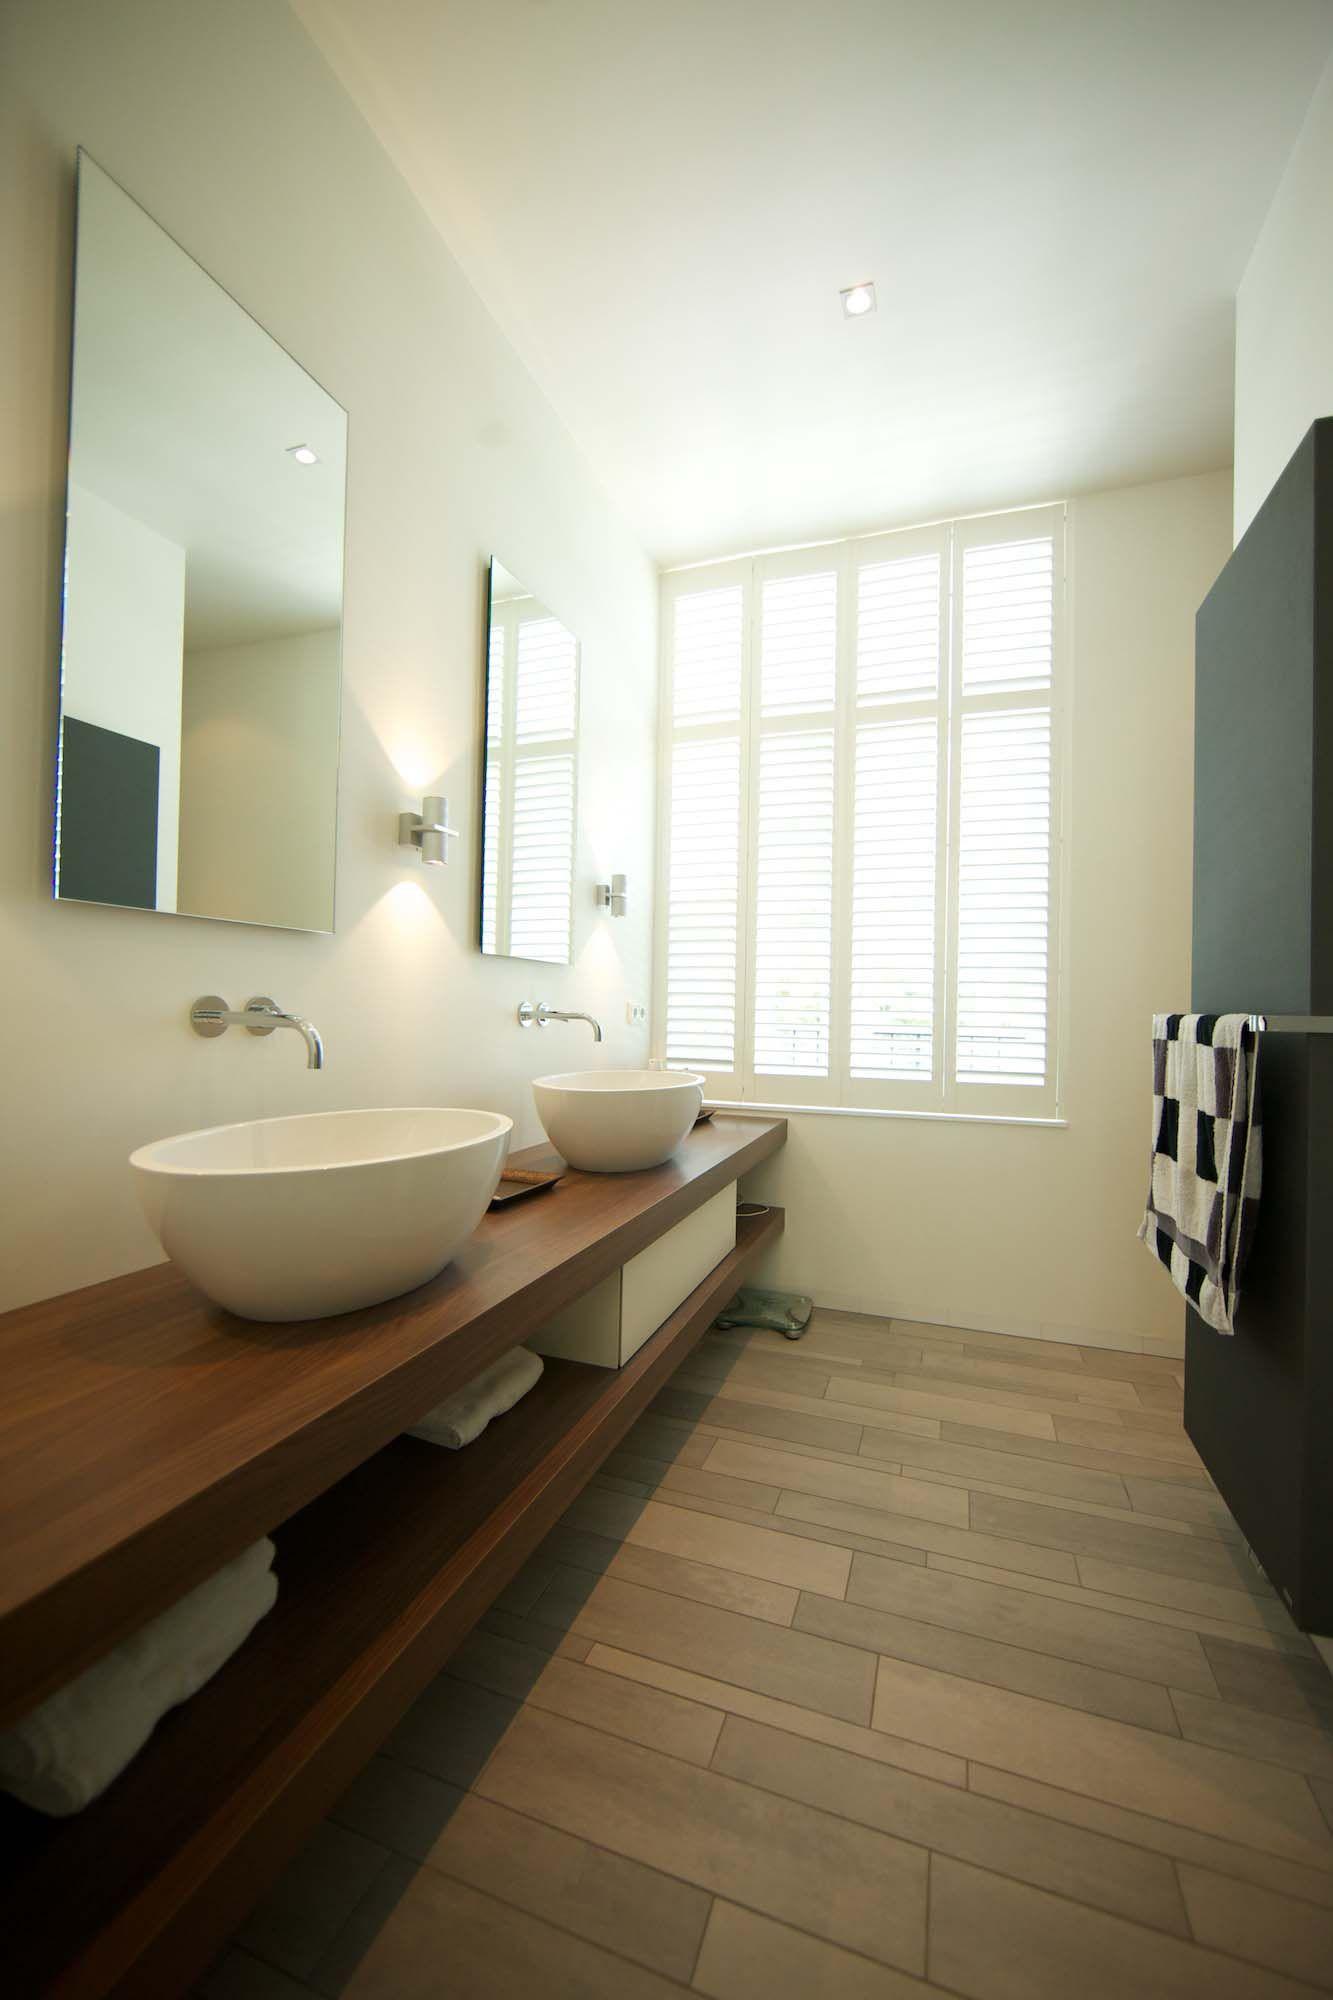 Kleines hotelbadezimmerdesign bathroom at villa kivits netherlands with terratones collection